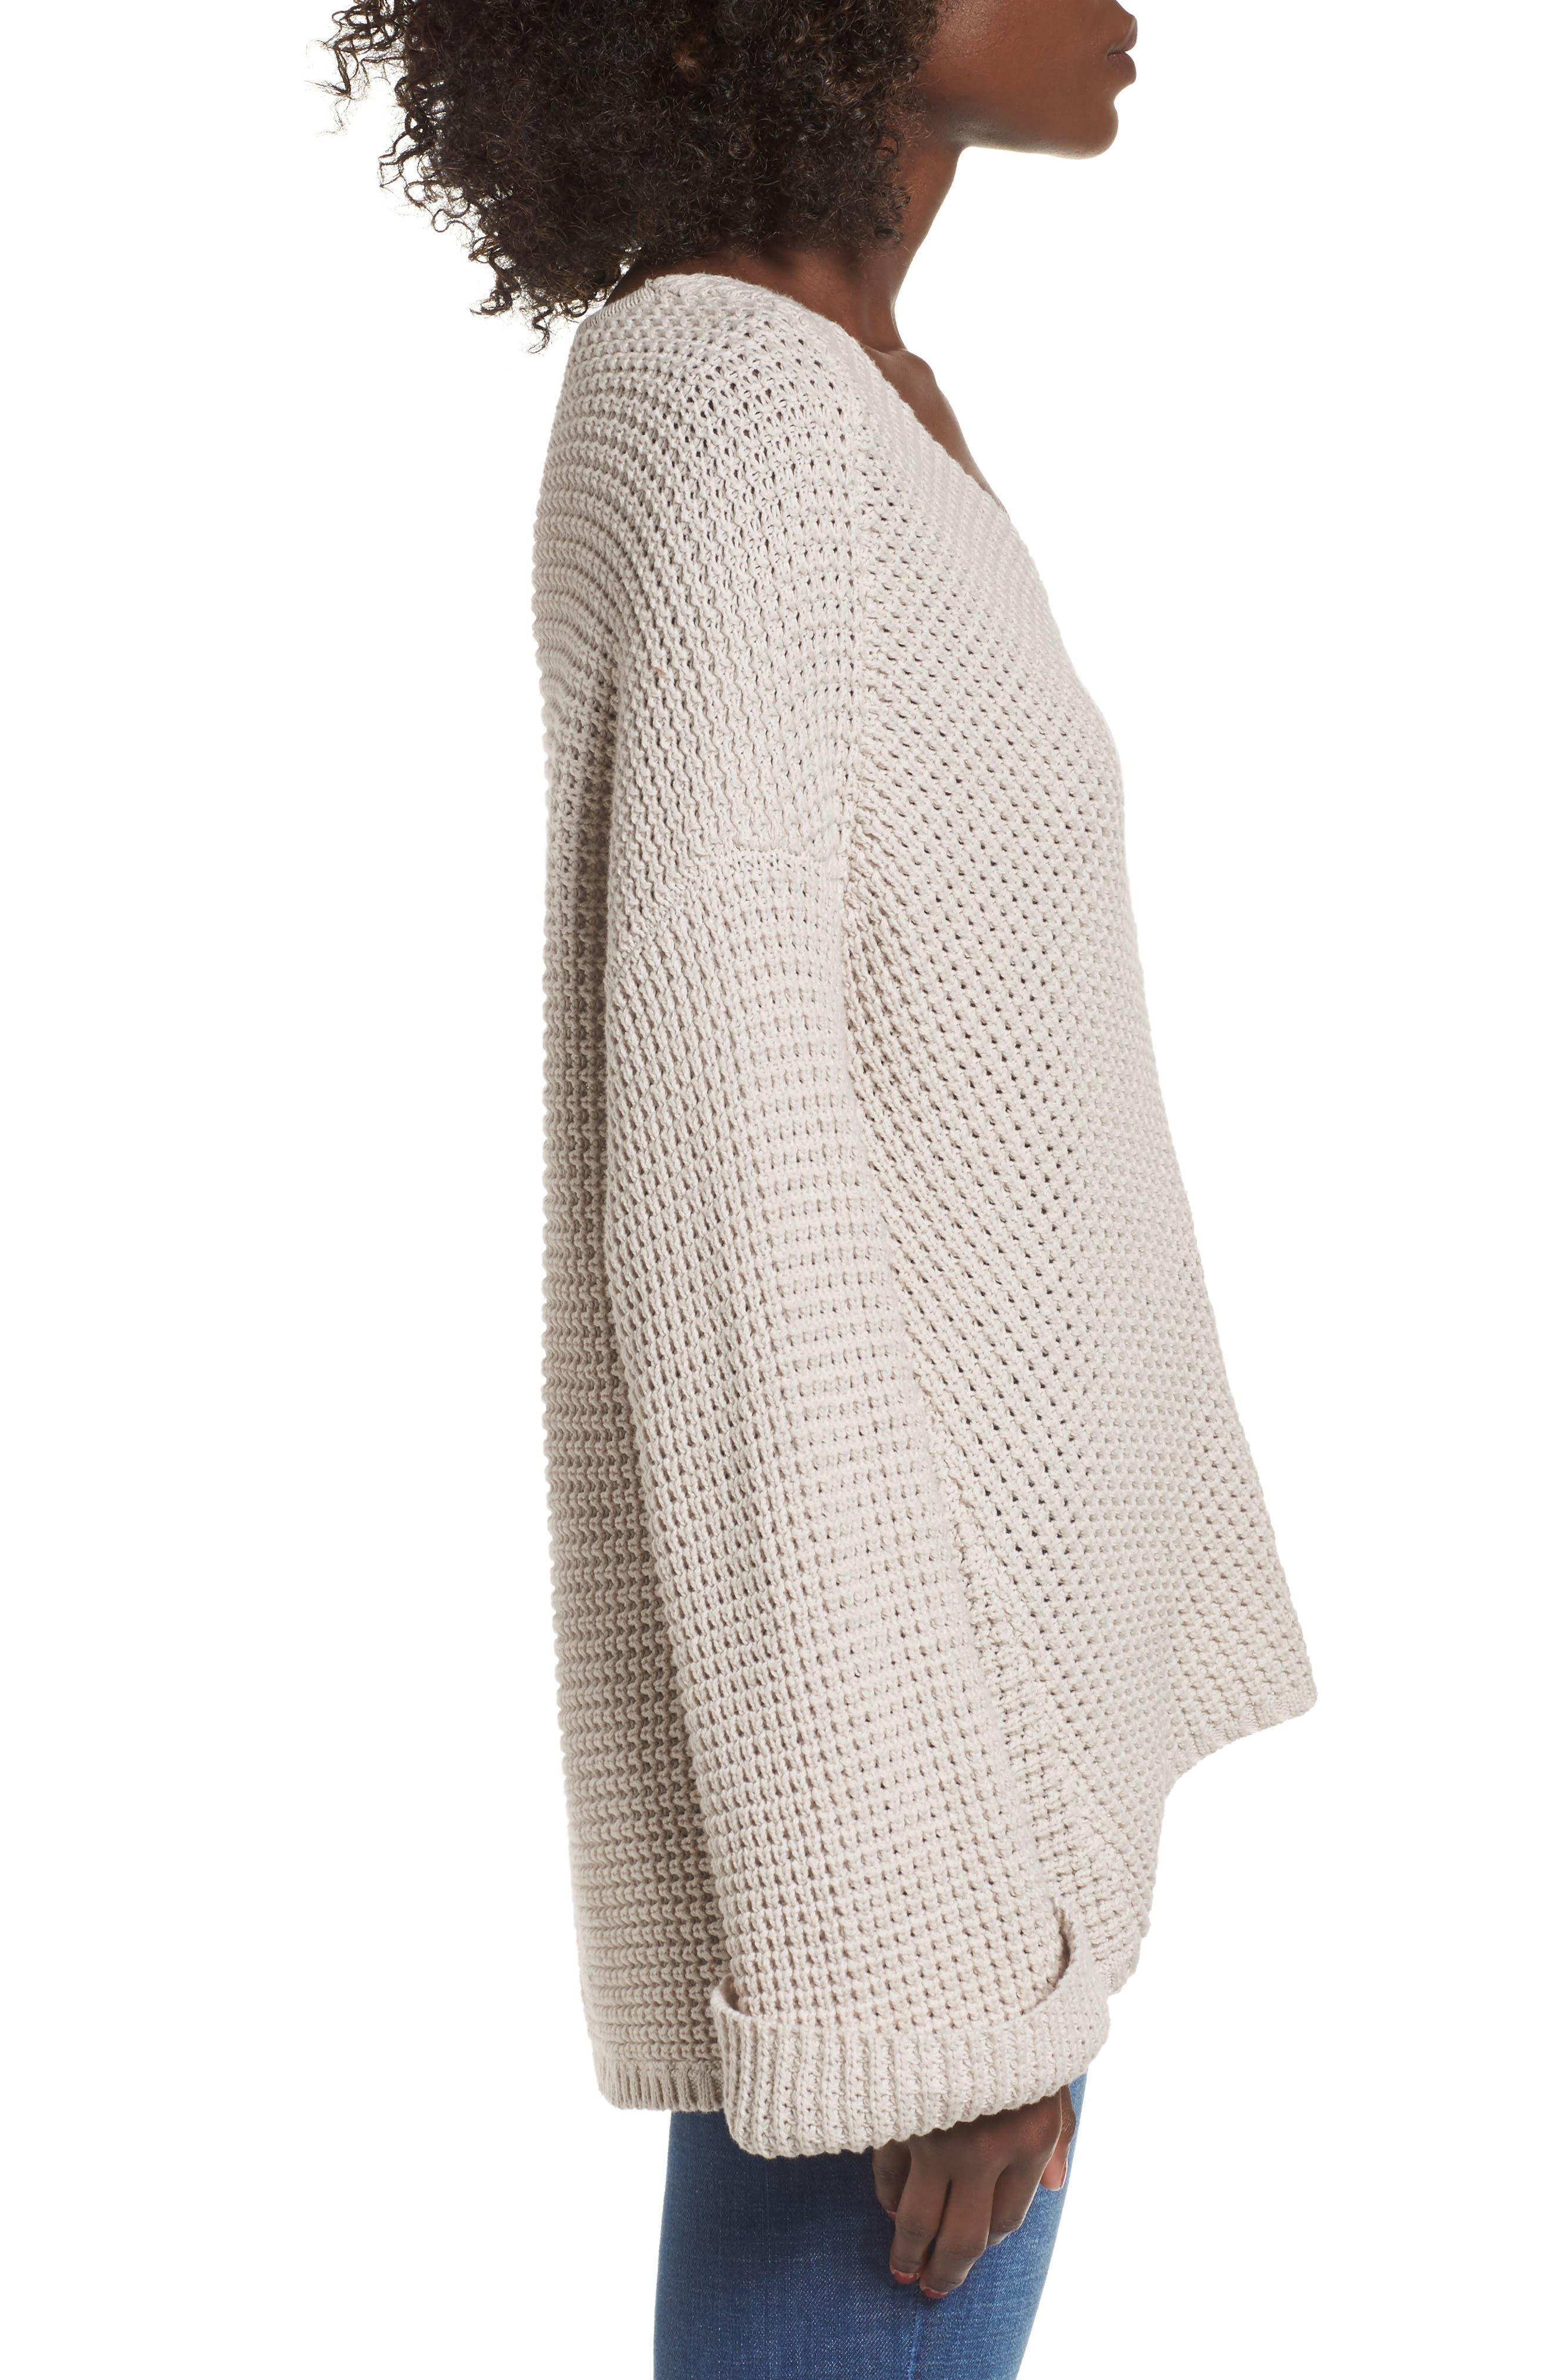 Adelia Bell Sleeve Sweater,                             Alternate thumbnail 3, color,                             900